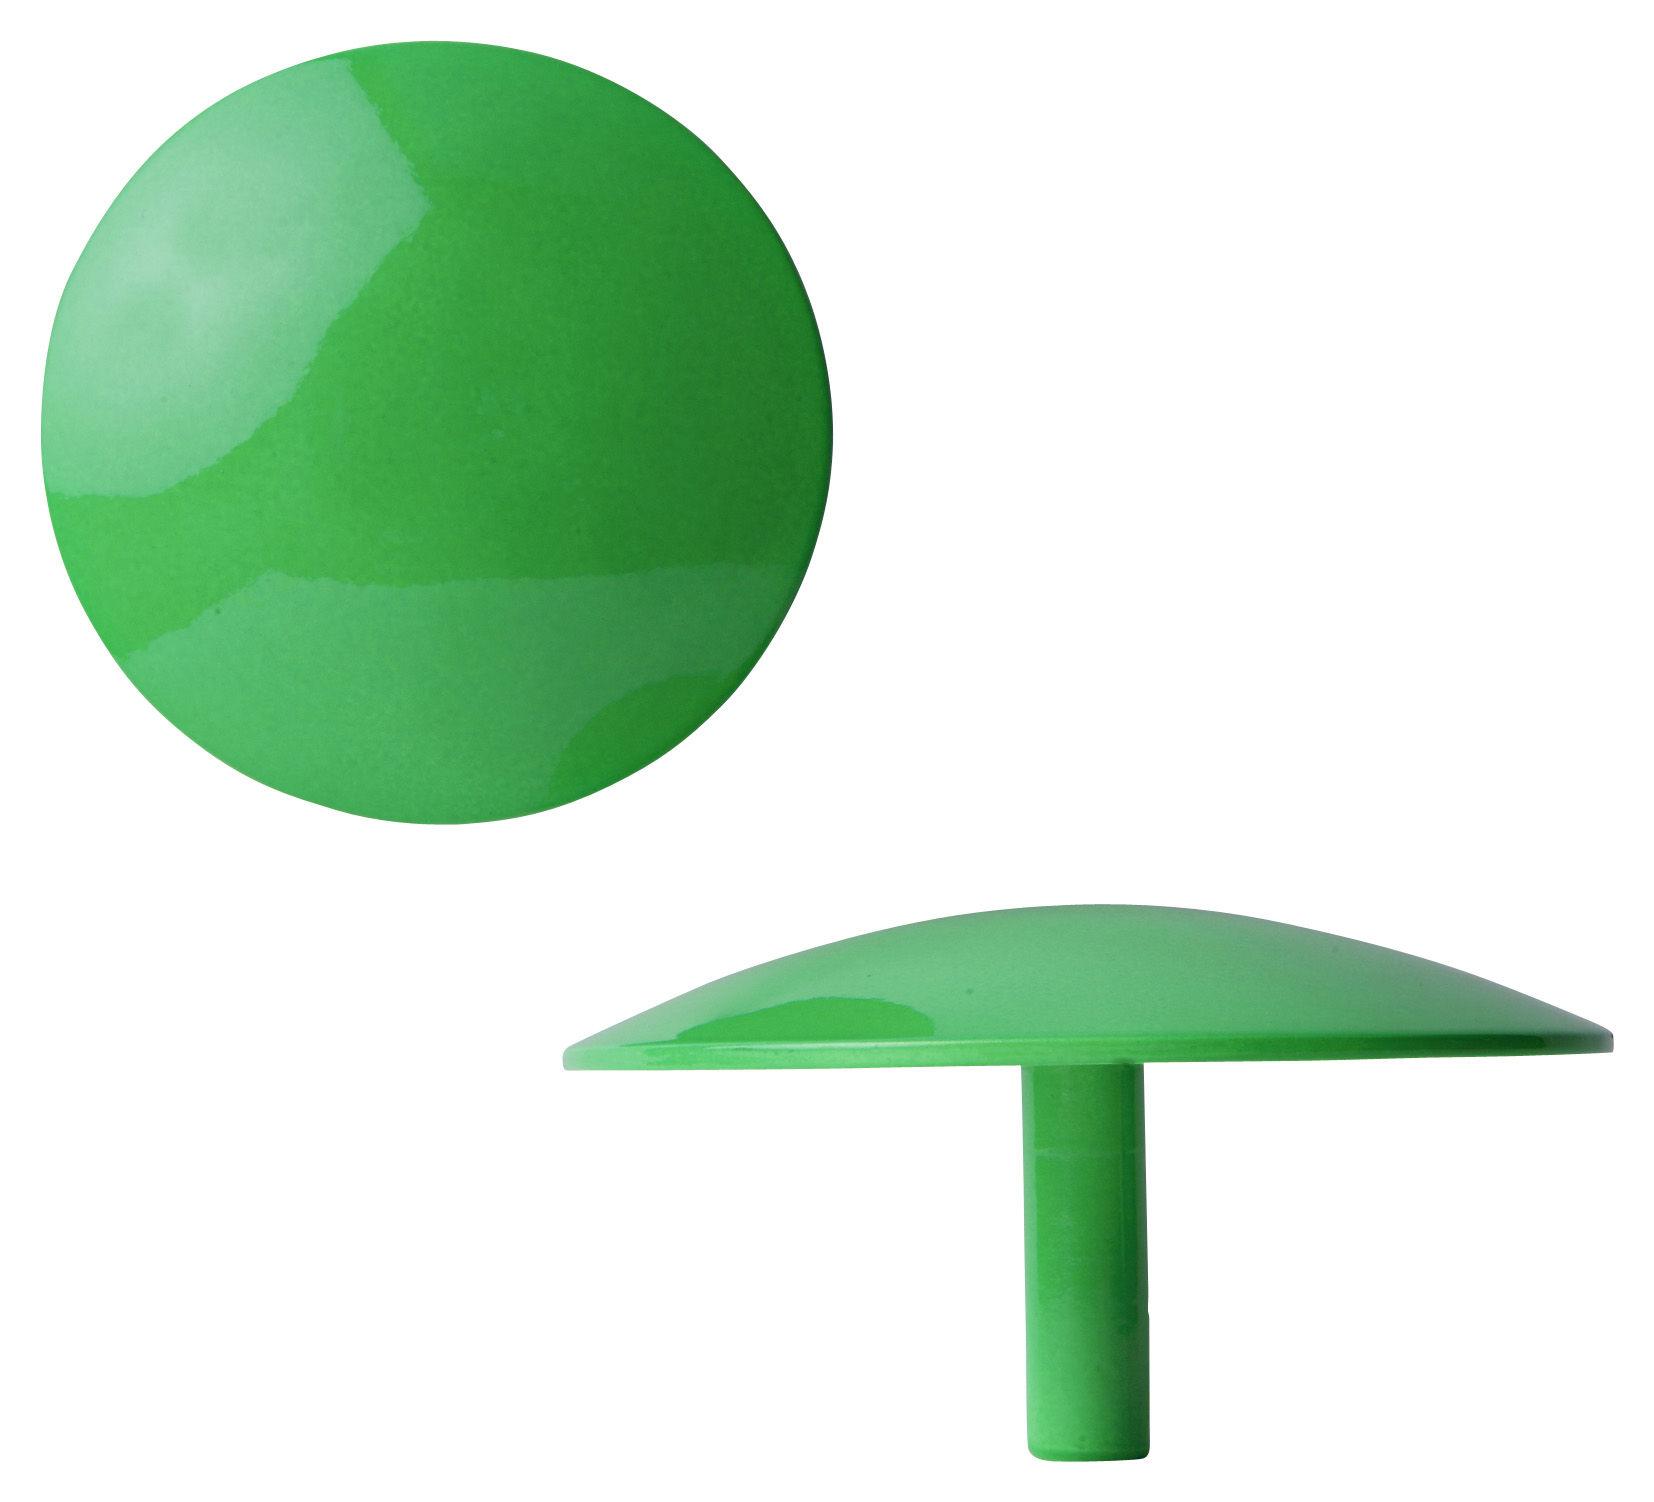 Furniture - Coat Racks & Pegs - Manto Hook - Fluo- Ø 10 cm by Sentou Edition - Green - Ø 10 cm - Lacquered cast aluminium